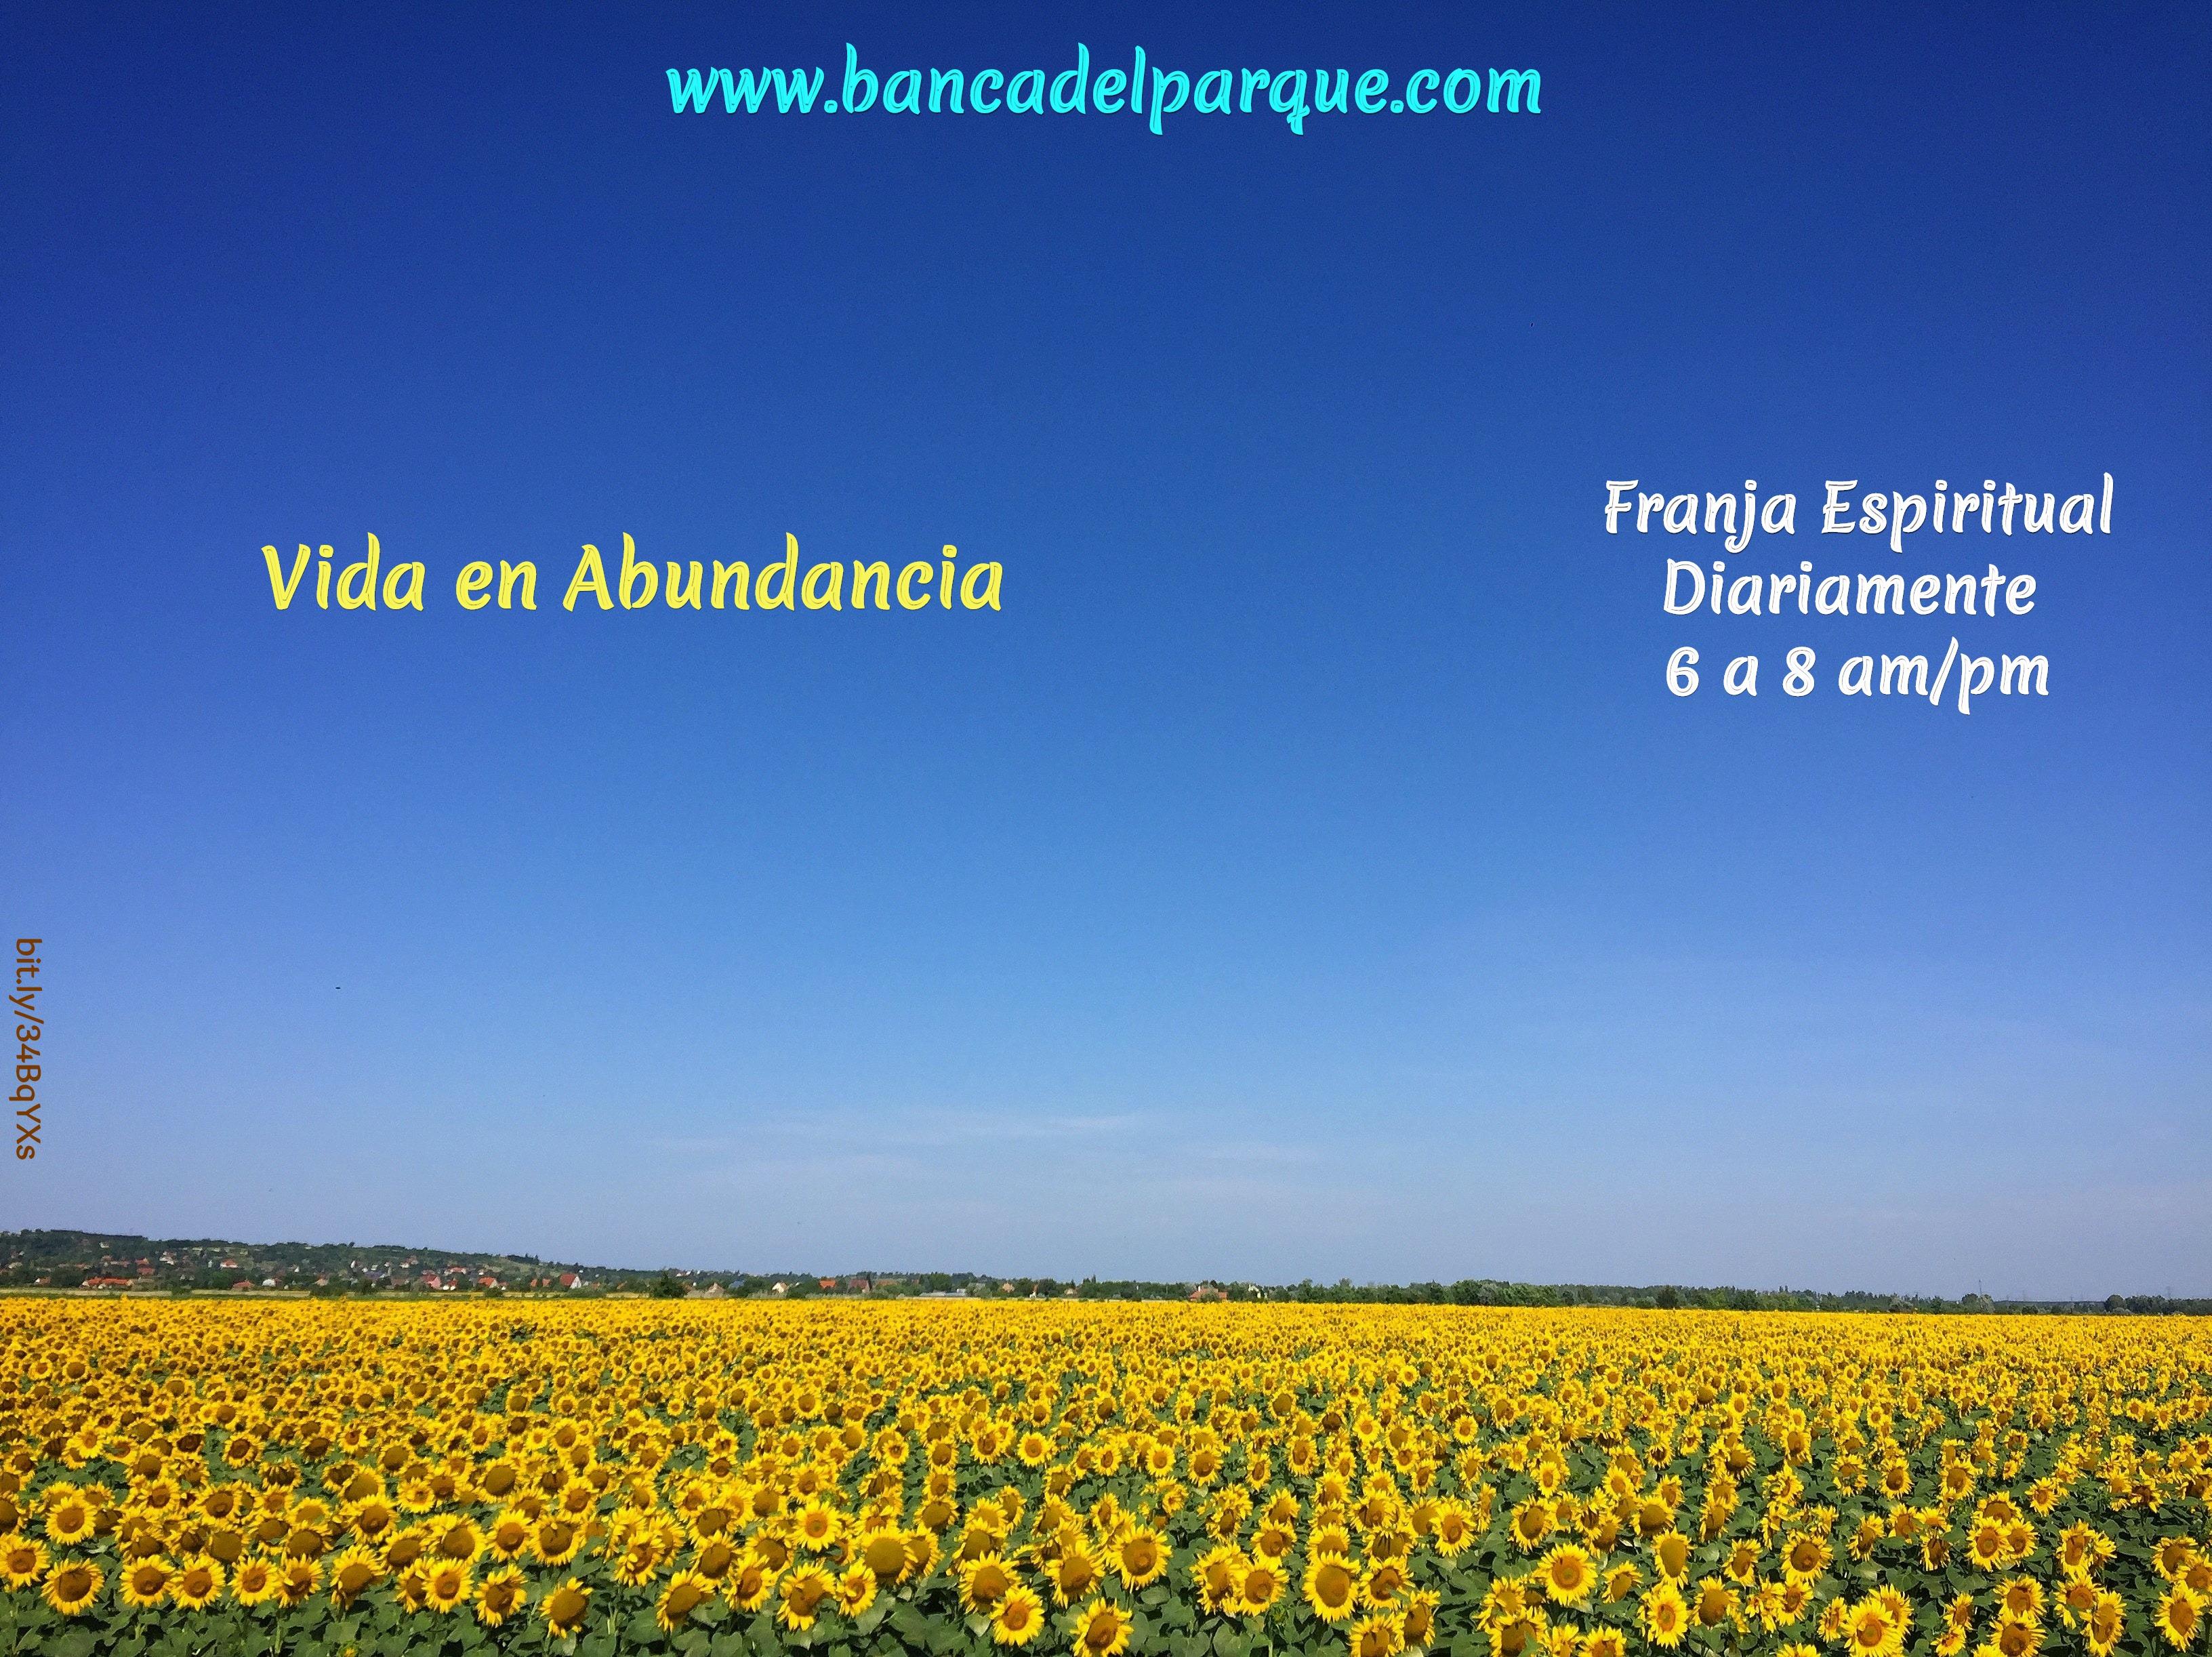 28.10.2020 - Vida en Abundancia